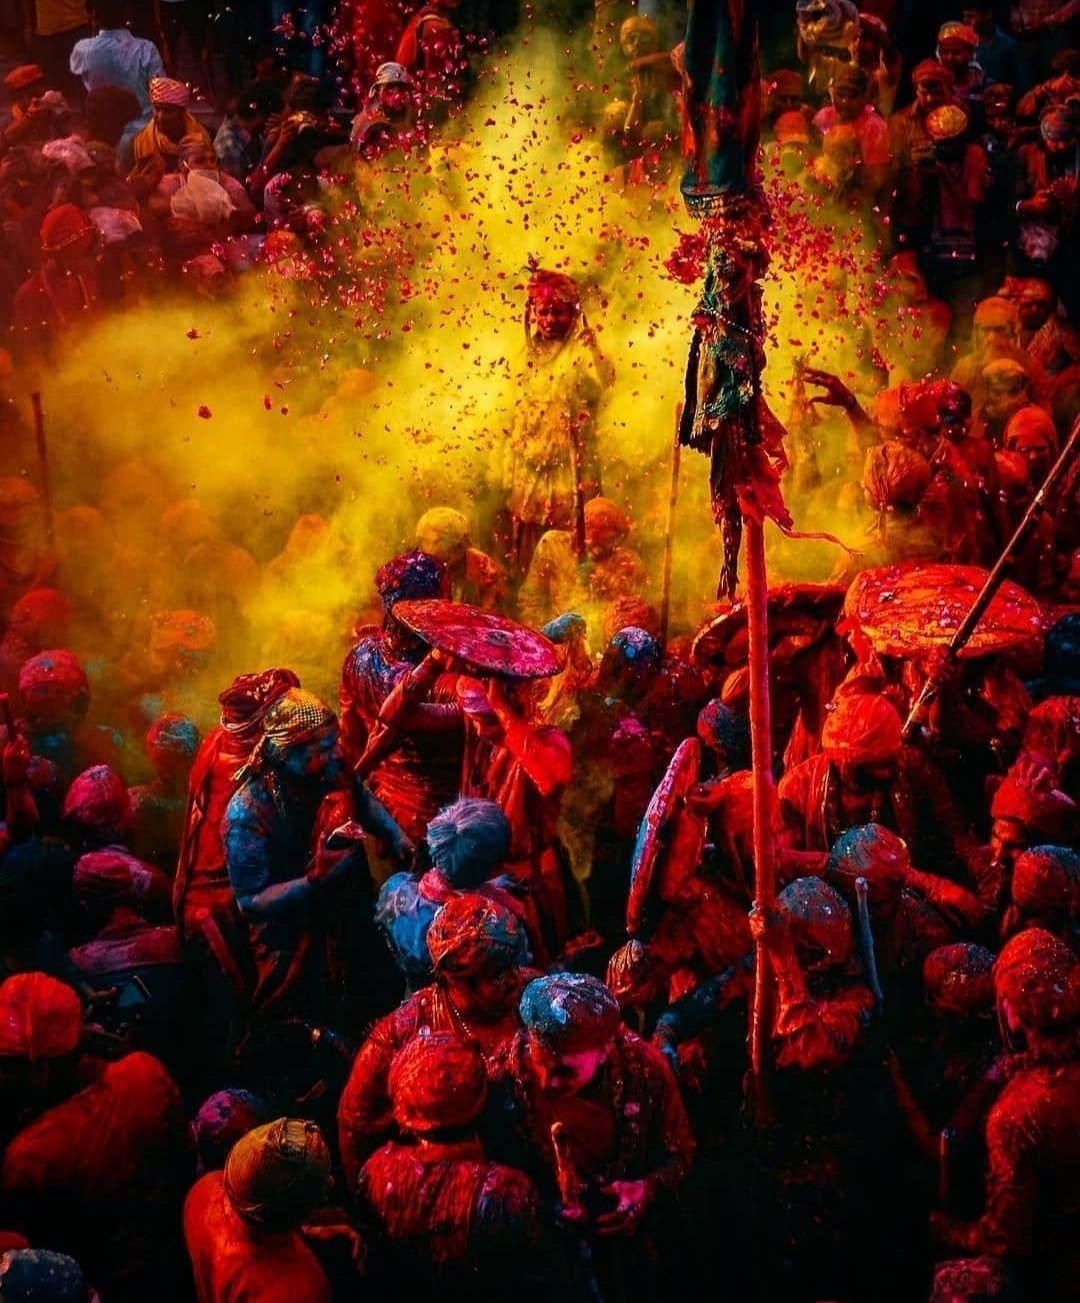 Happy Holi  BAAL KRISHNA ANIMATED IMAGES ANIMATION GIFS PHOTO GALLERY  | 2.BP.BLOGSPOT.COM  EDUCRATSWEB